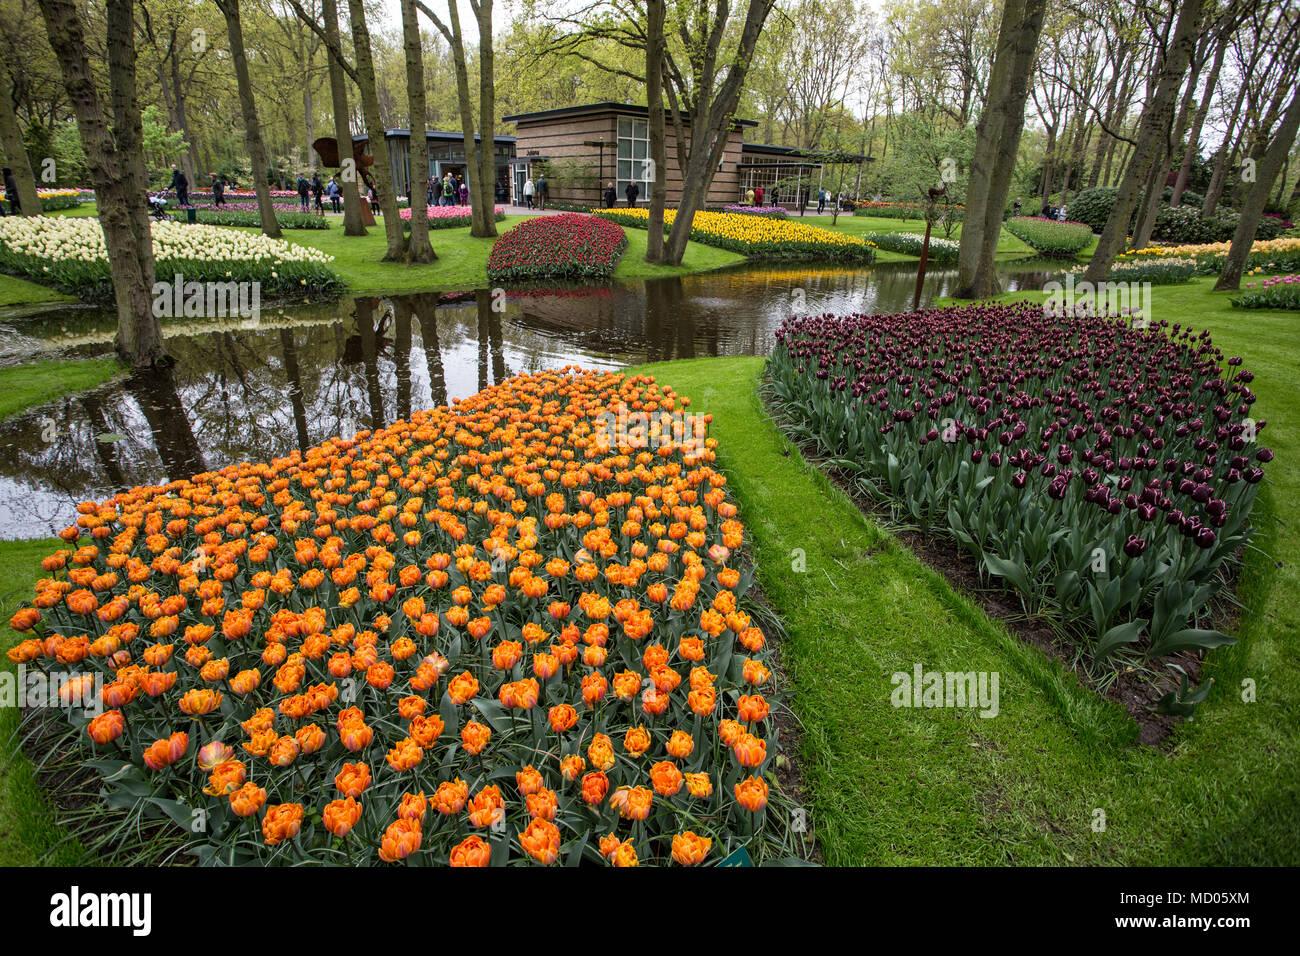 Keukenhof Gardens Stock Photos & Keukenhof Gardens Stock Images - Alamy